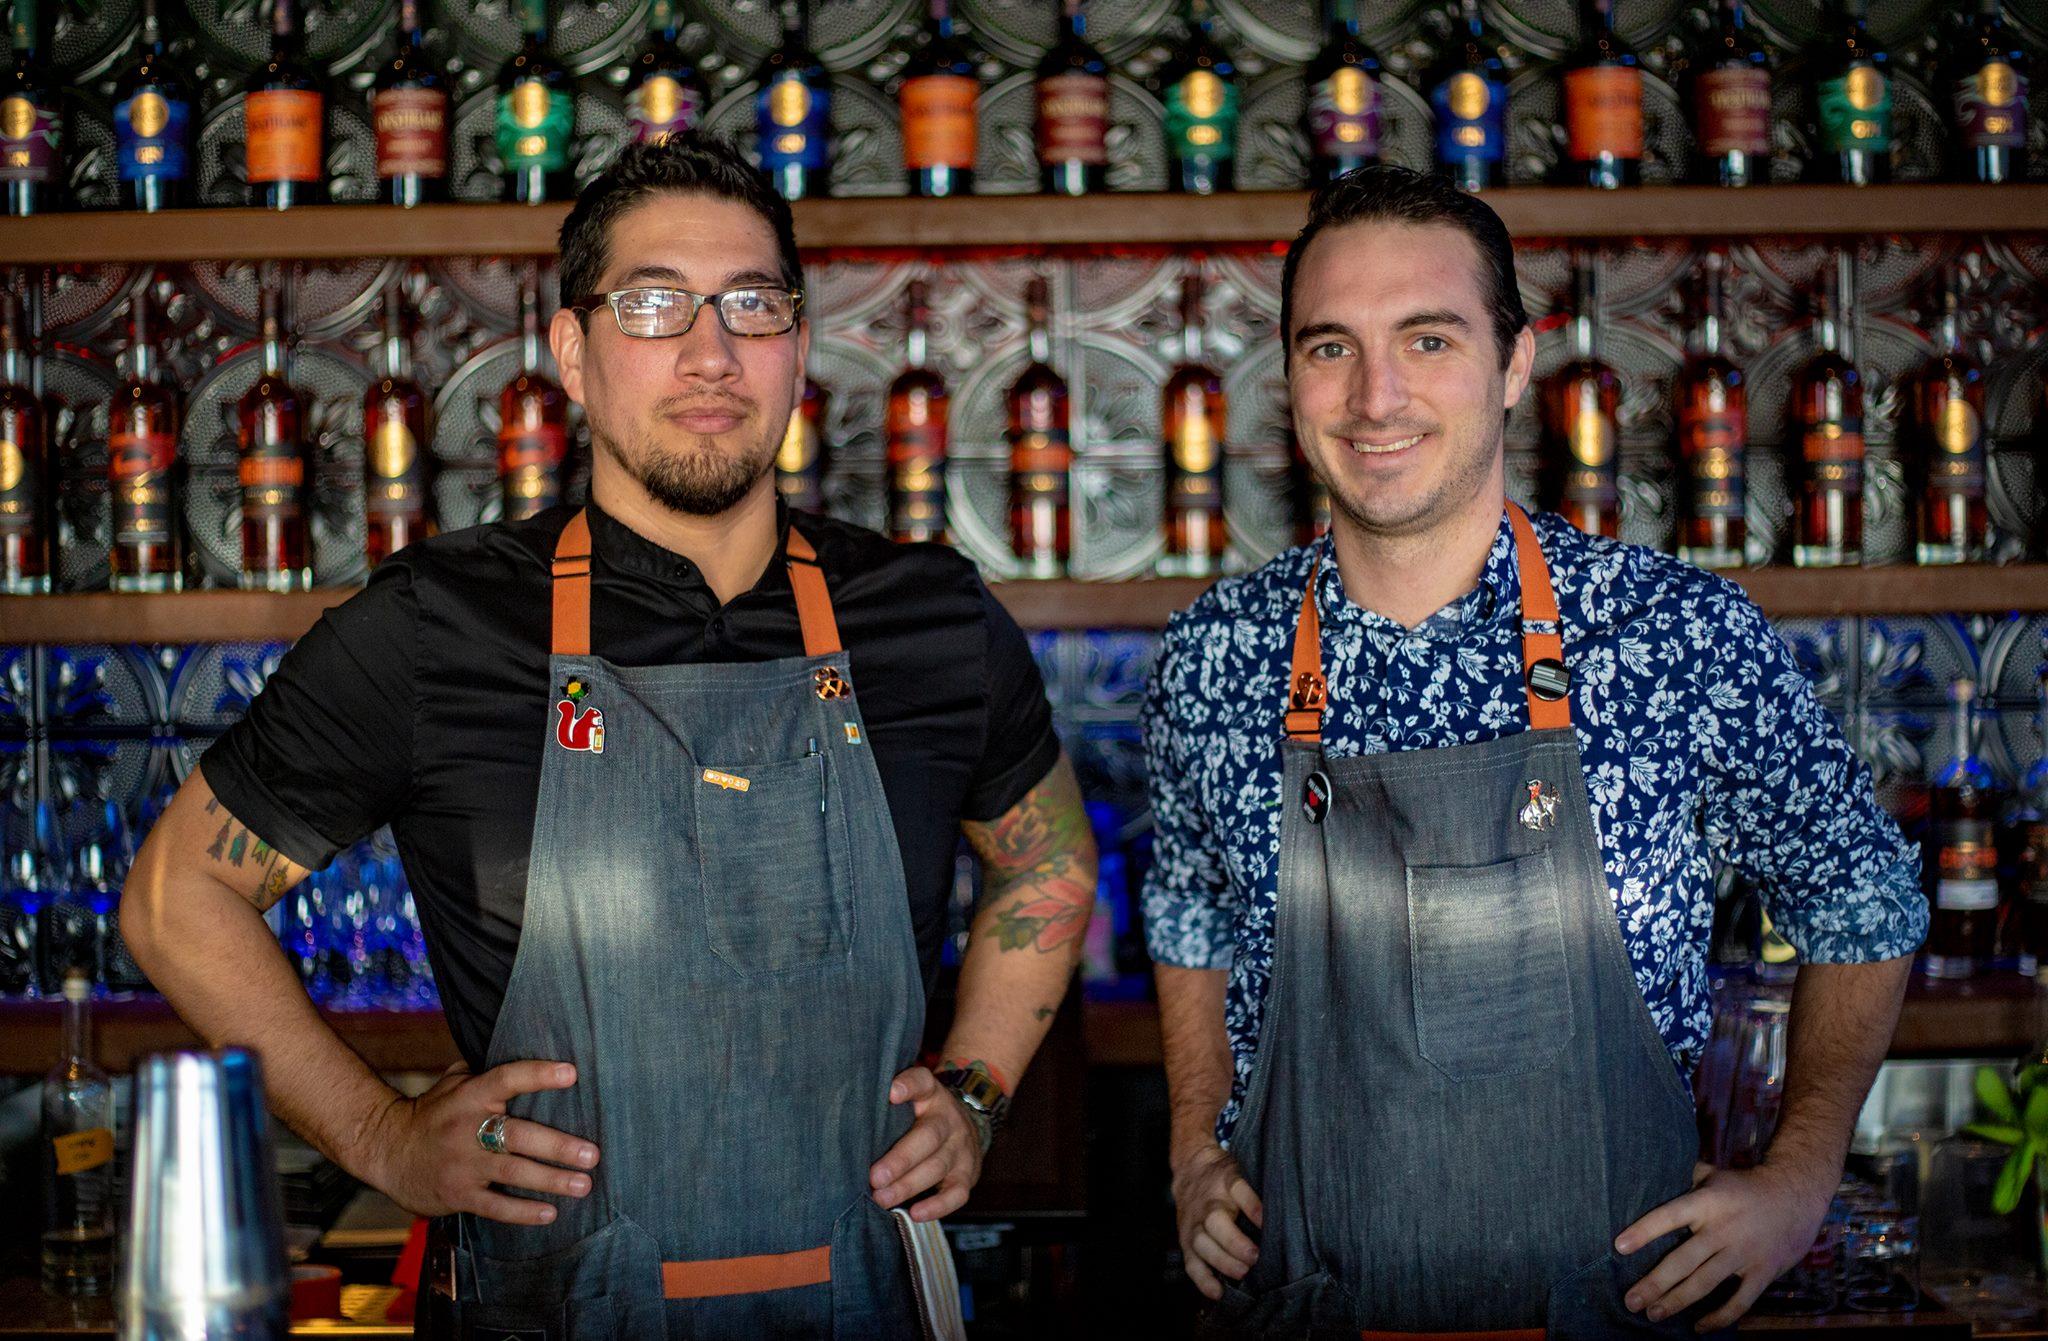 L: Cocktail mixologist Eron Plevan; R: Mocktail mixologist Jesse Hawkins